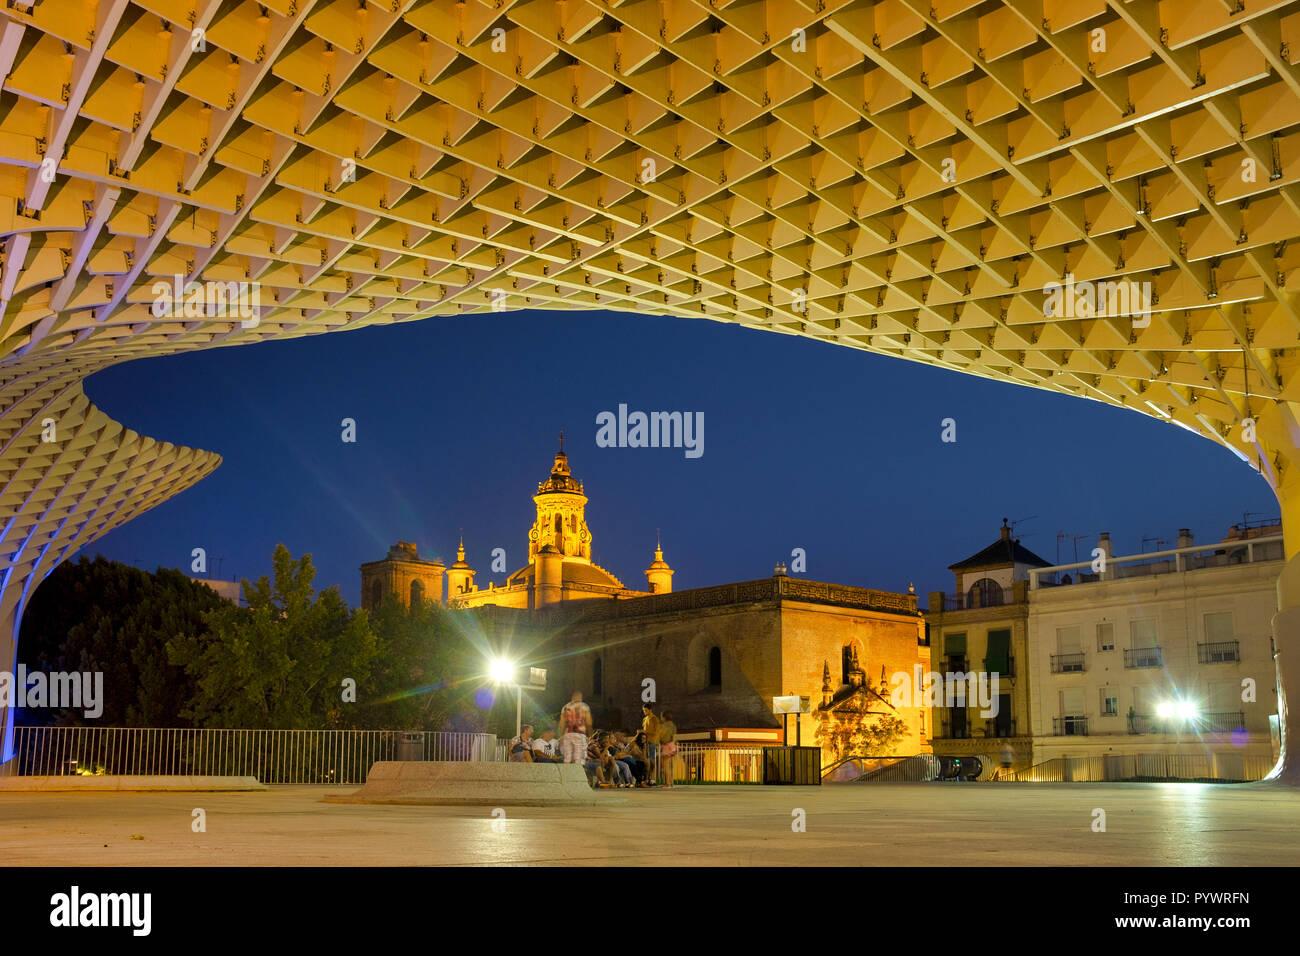 Metropol Parasol in La Encarnacion Square, Seville, Spain - Stock Image